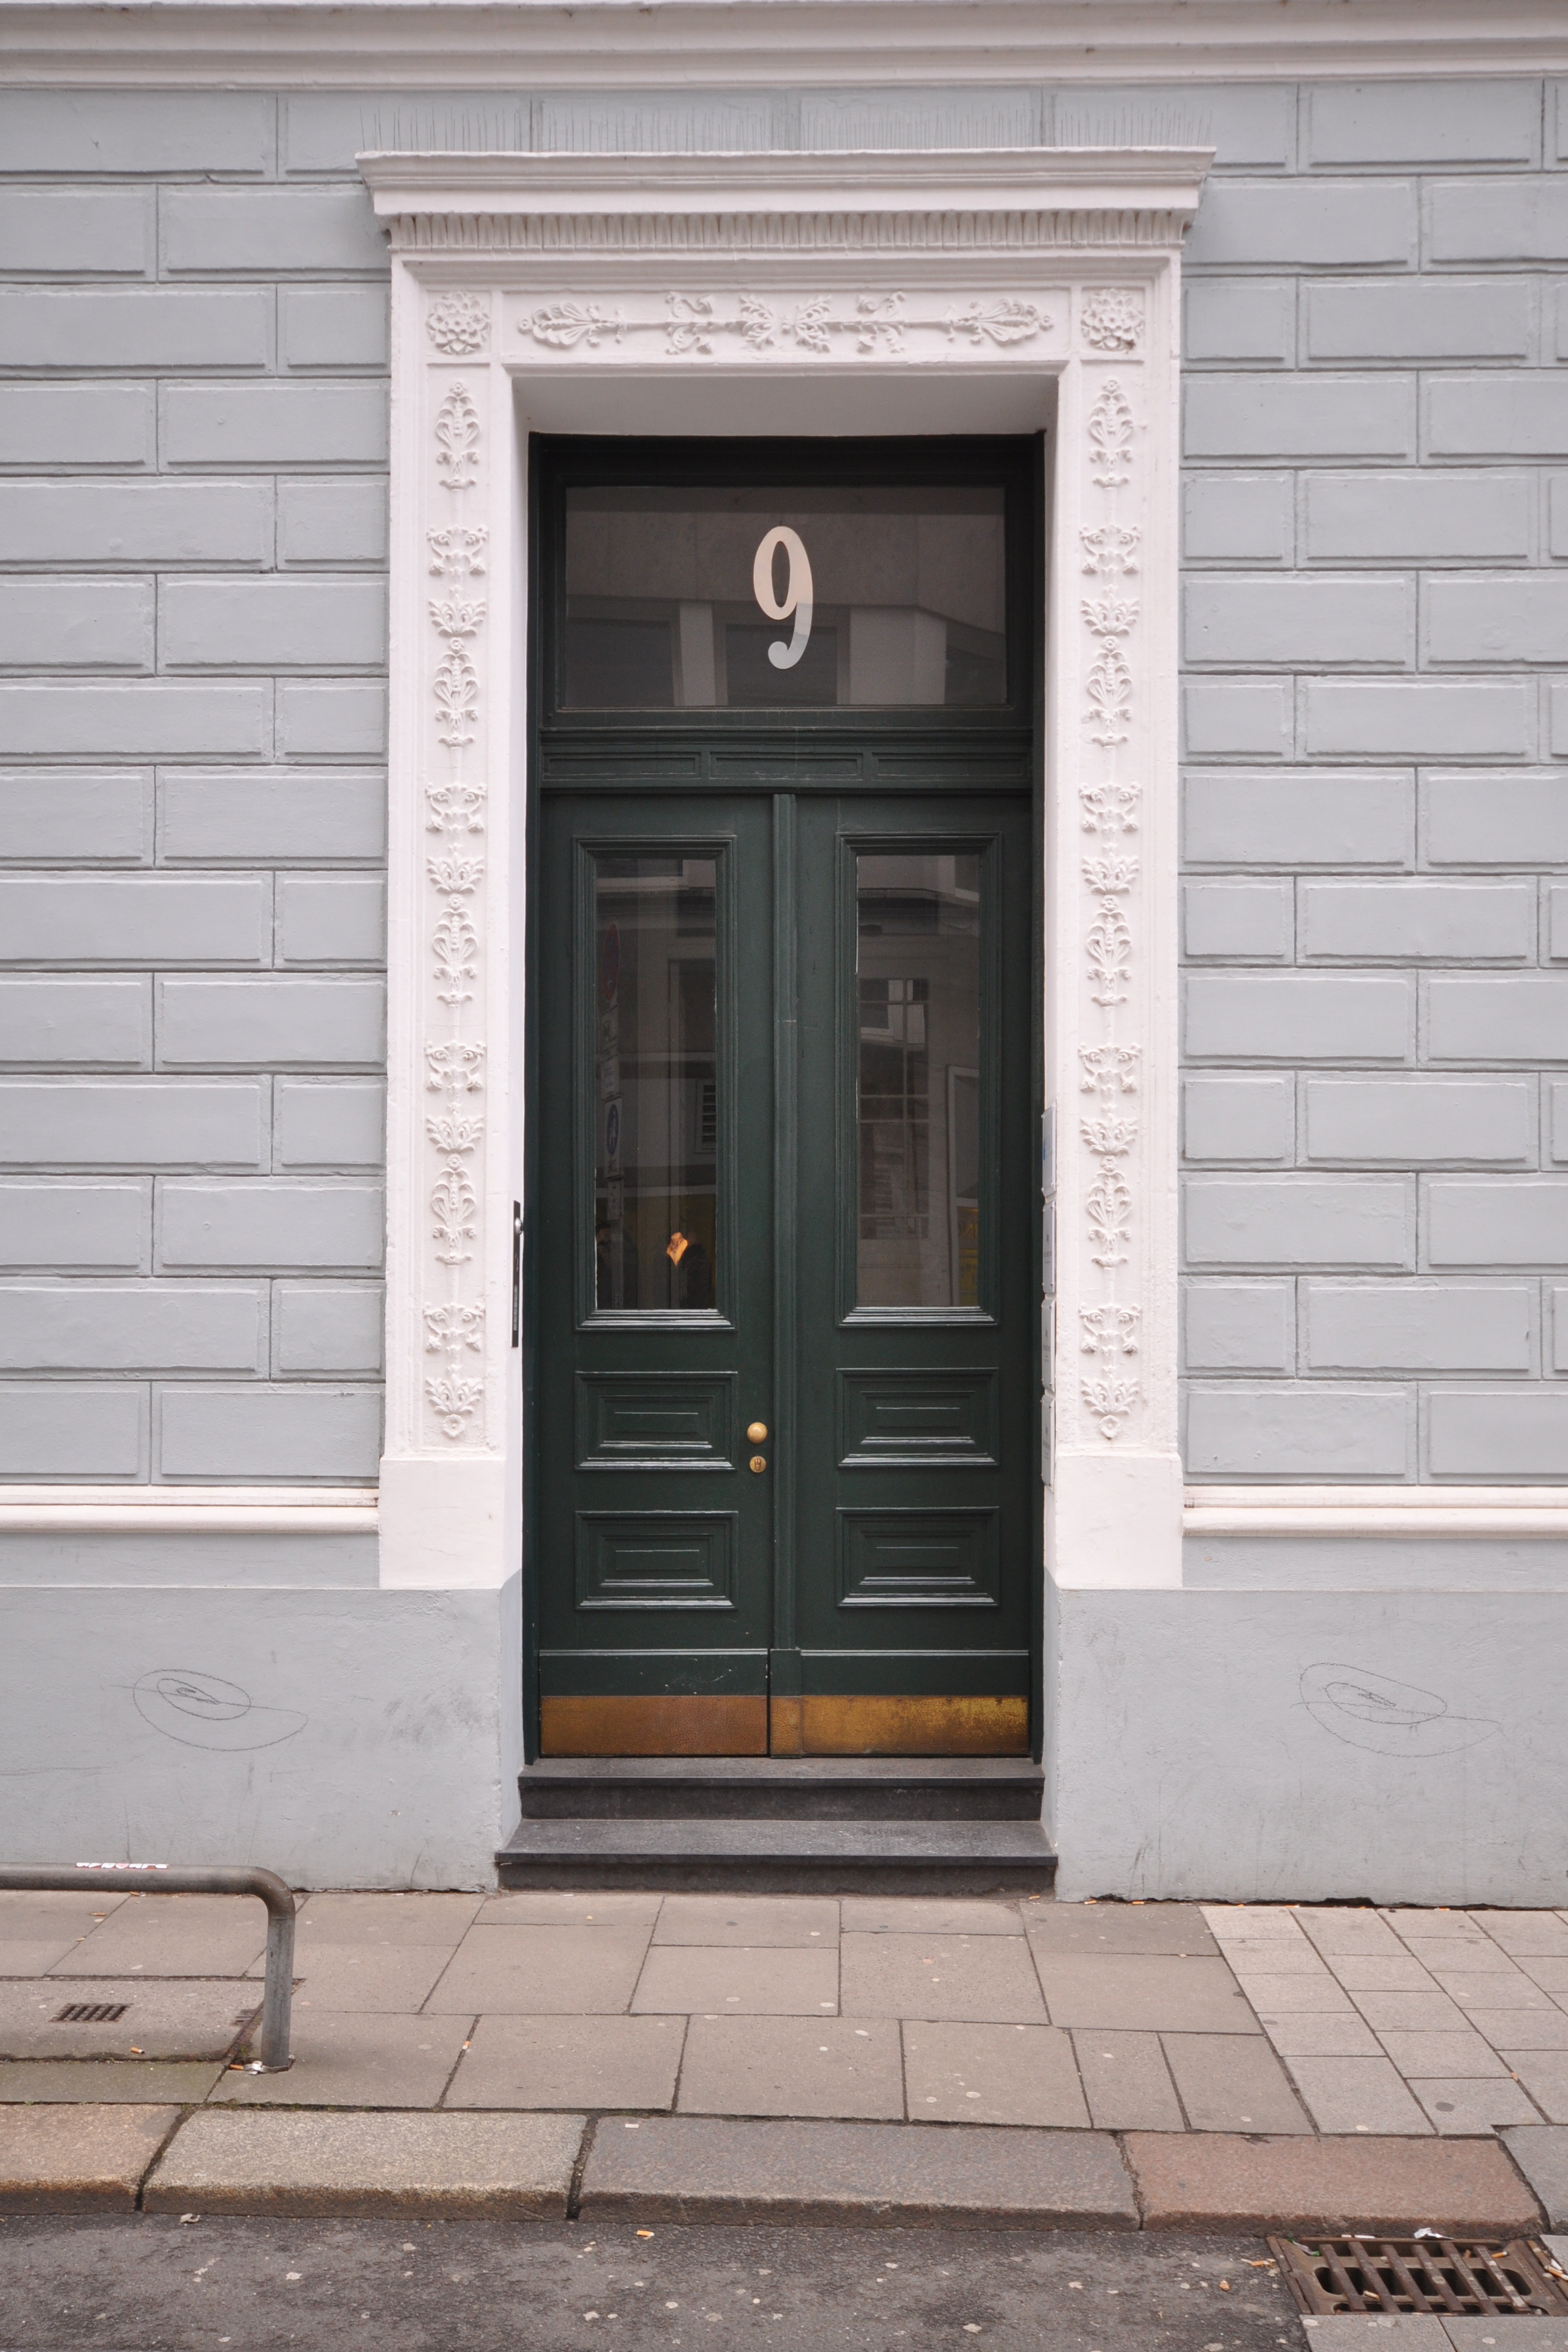 File:Büschstraße 9 (Hamburg Neustadt).Tür.ajb